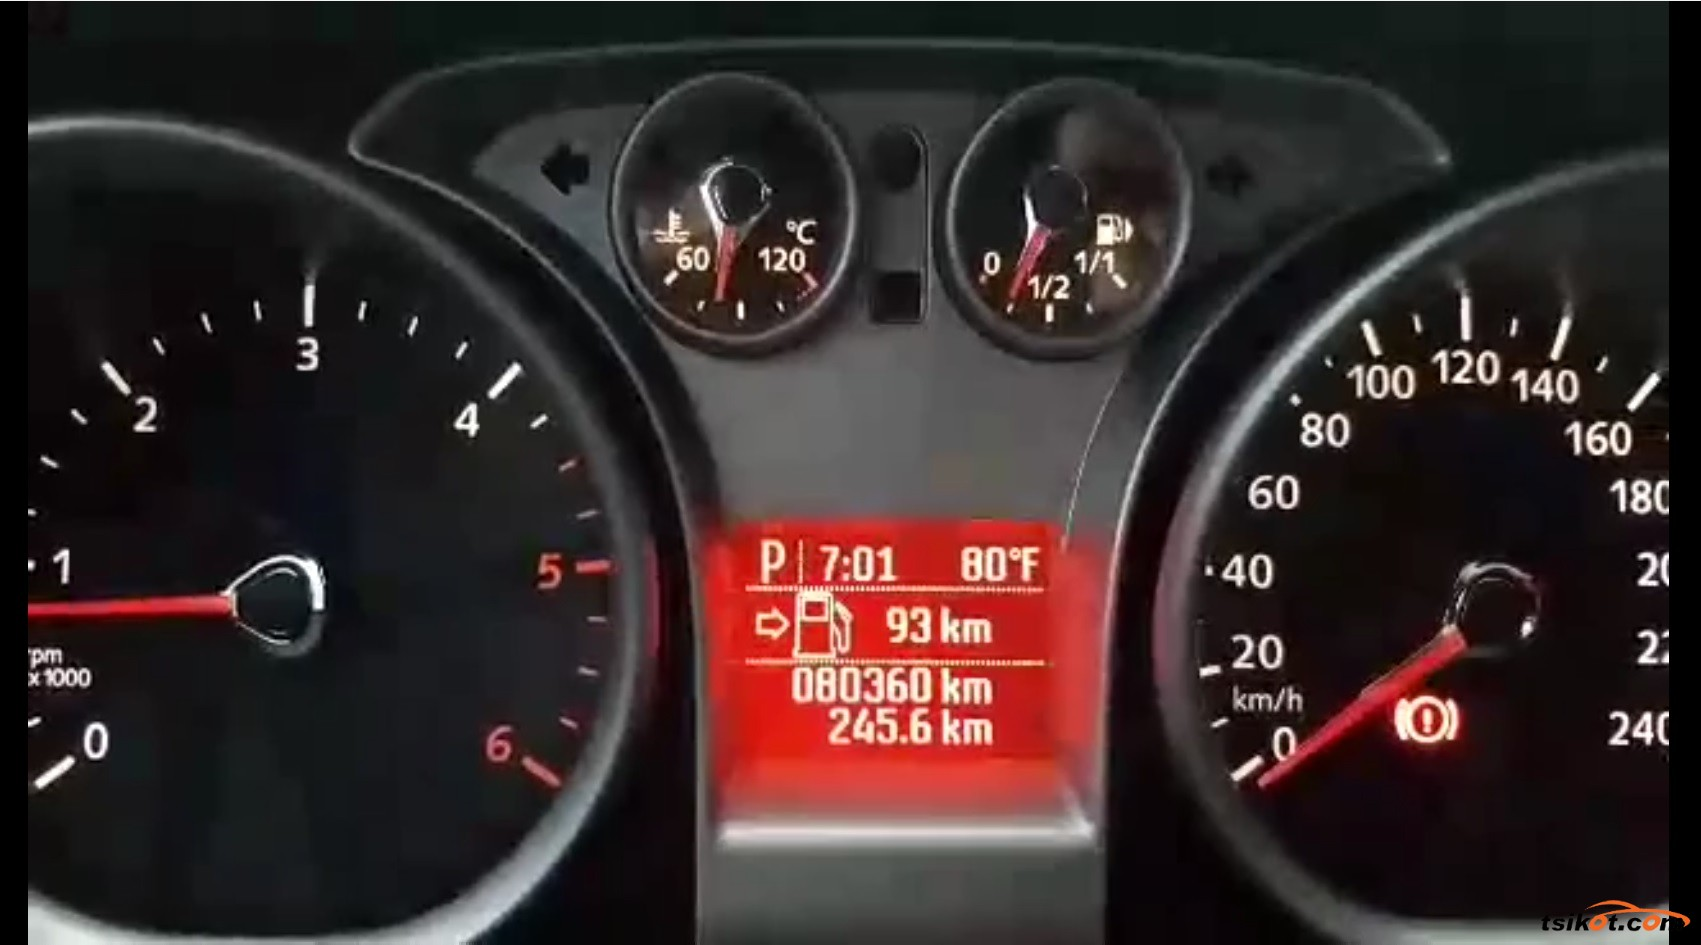 Ford Focus 2010 - 8